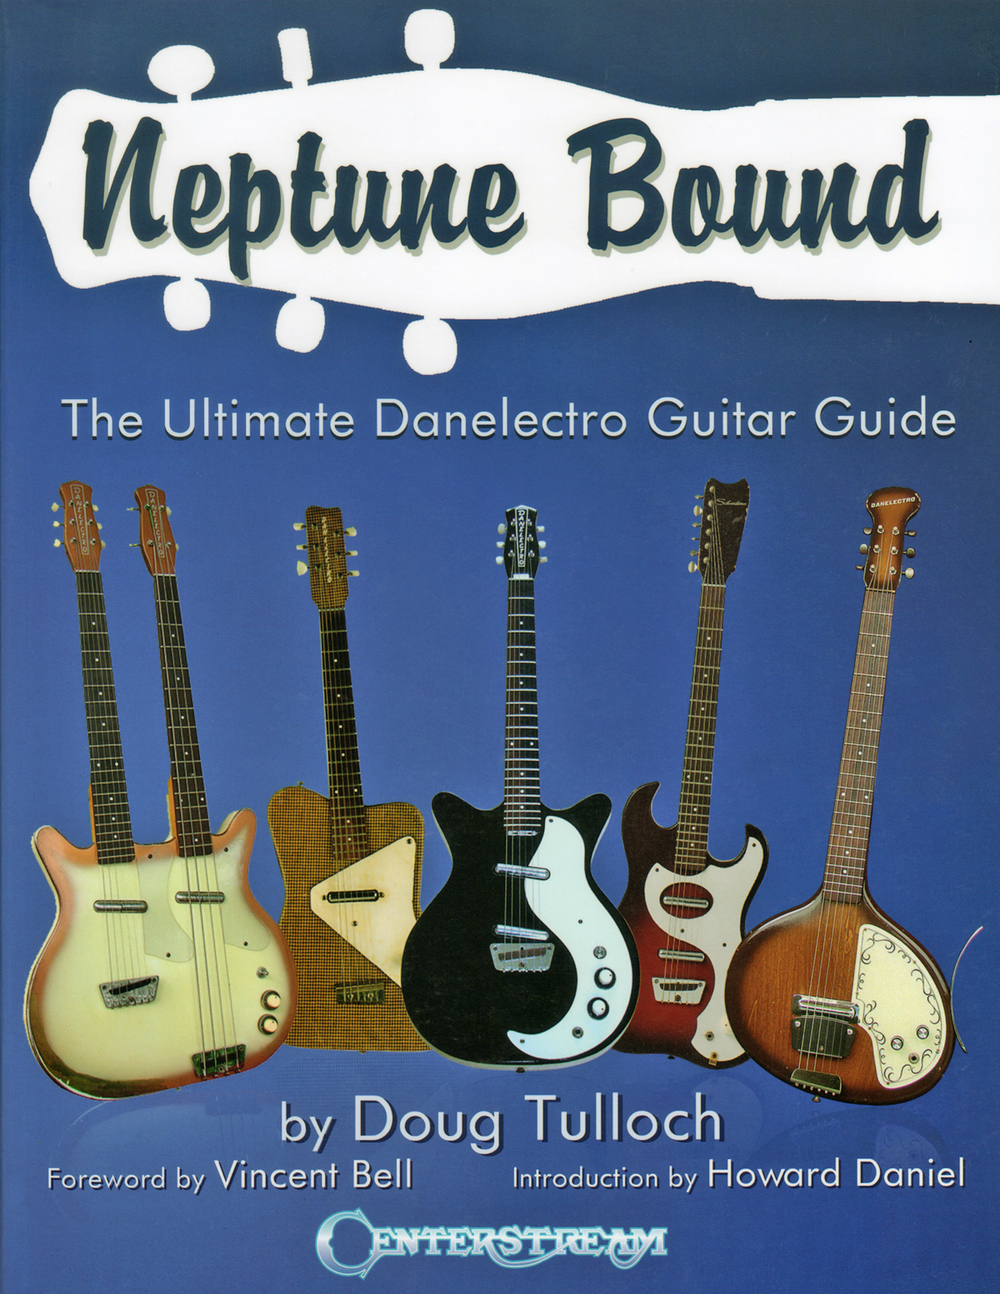 Neptune Bound: The Ultimate Danelectro Guitar Guide